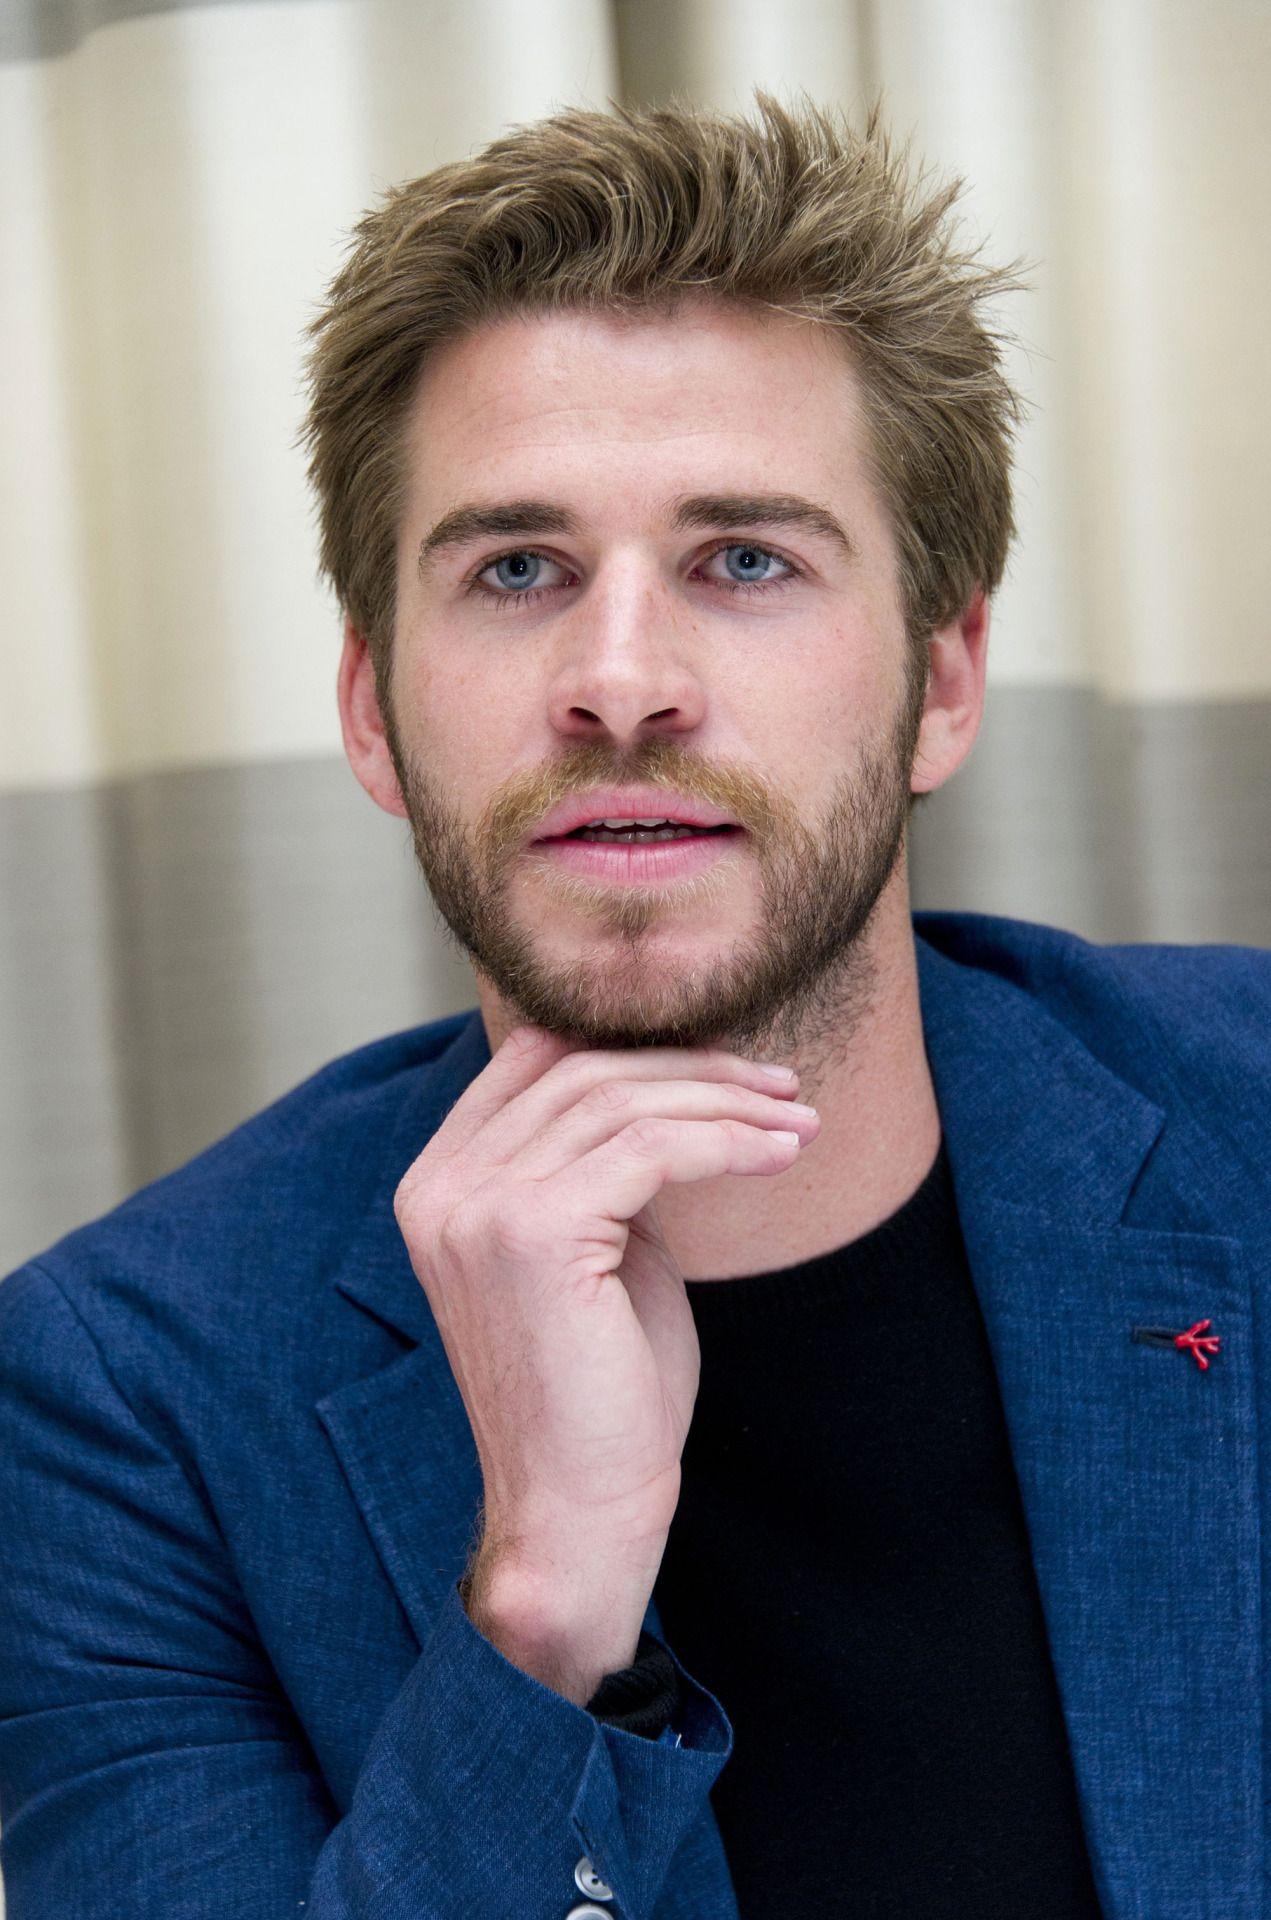 Liam Hemsworth (With images) Liam hemsworth, Hemsworth